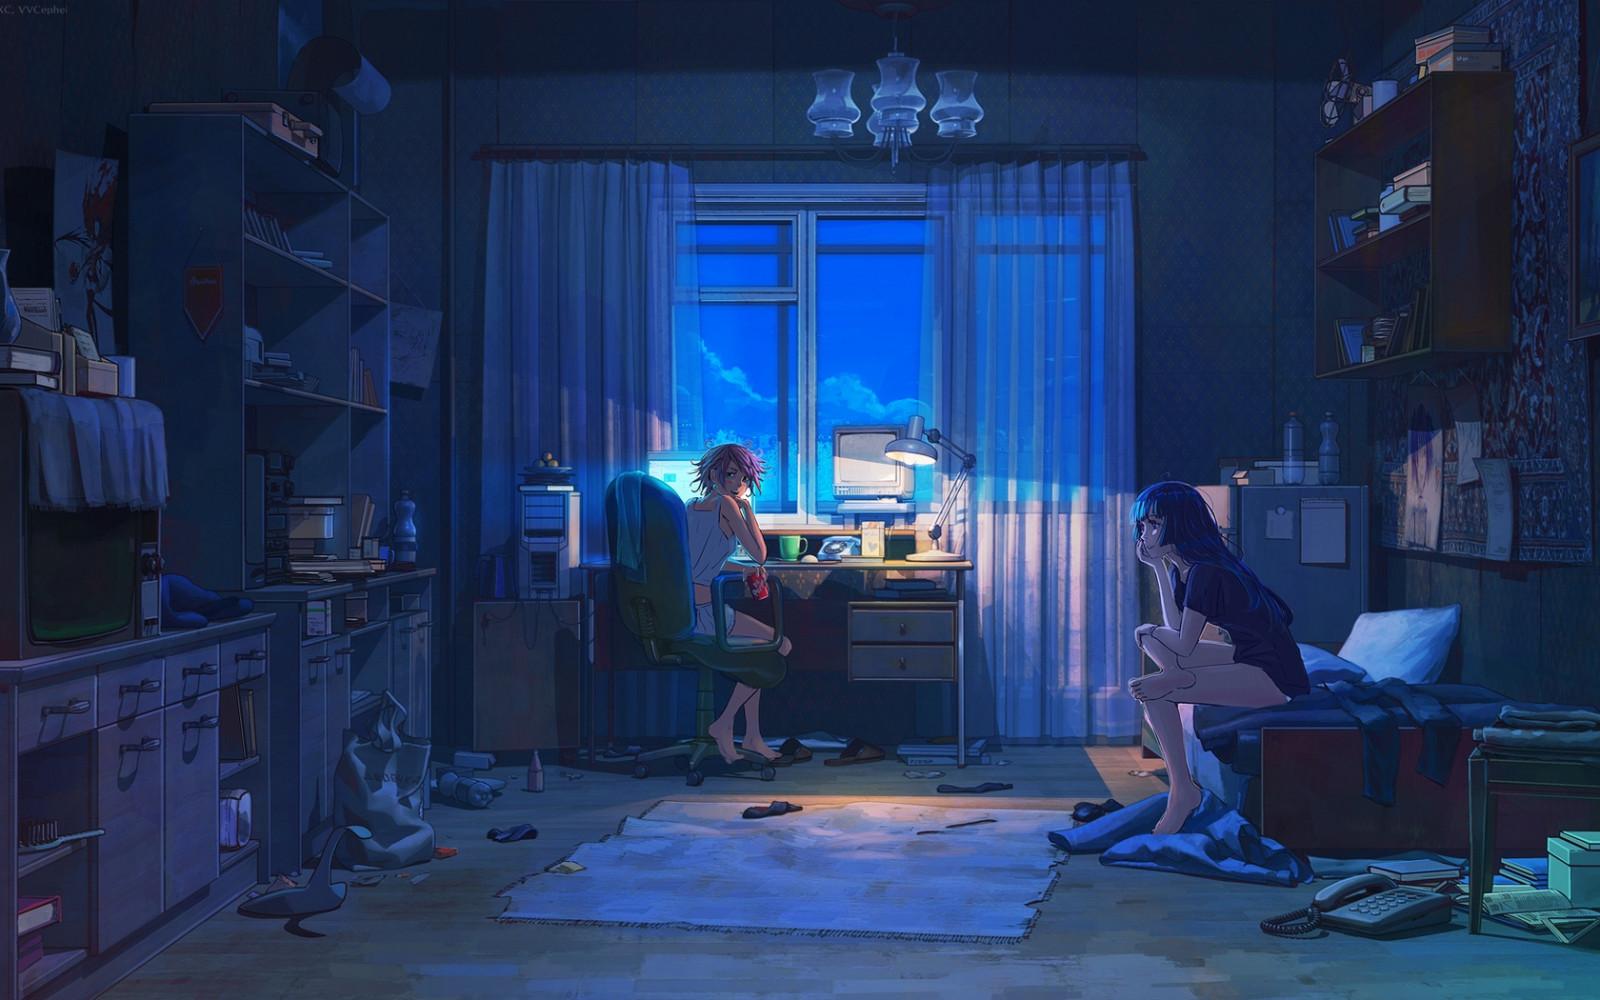 Fondos de pantalla noche habitaci n azul l mpara computadora televisi n estanter a - Lampara estanteria ...